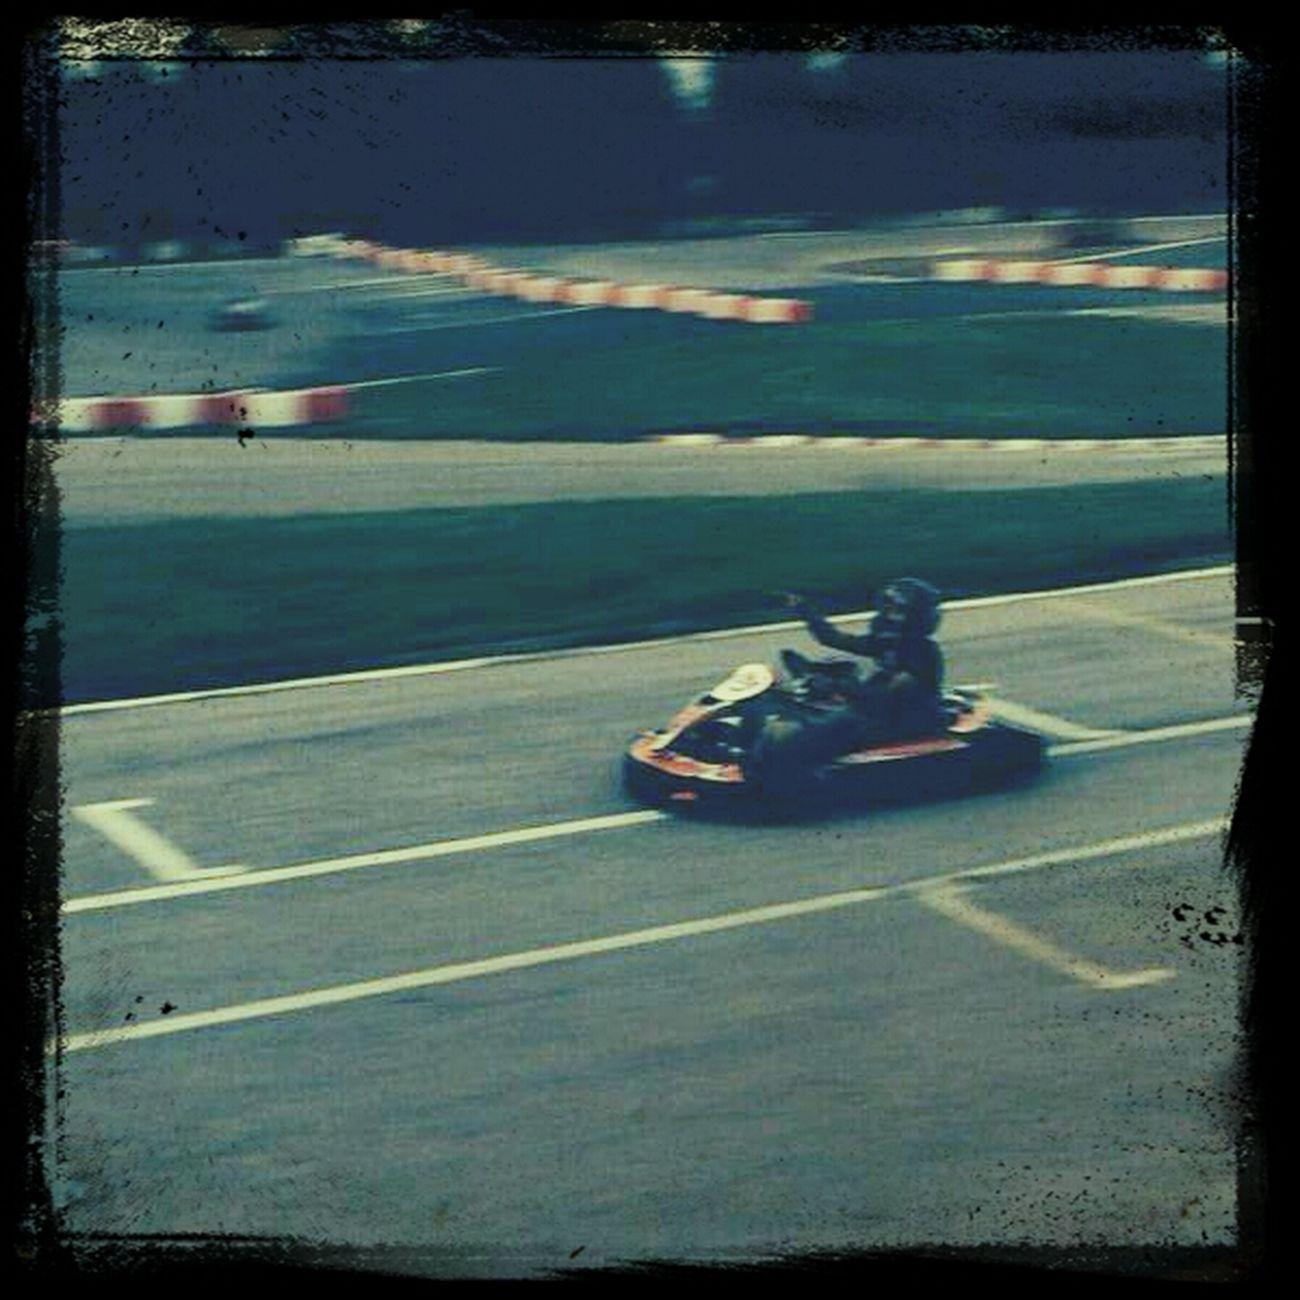 Go Kart Gokarting Karting Me At Pitstop Zouk